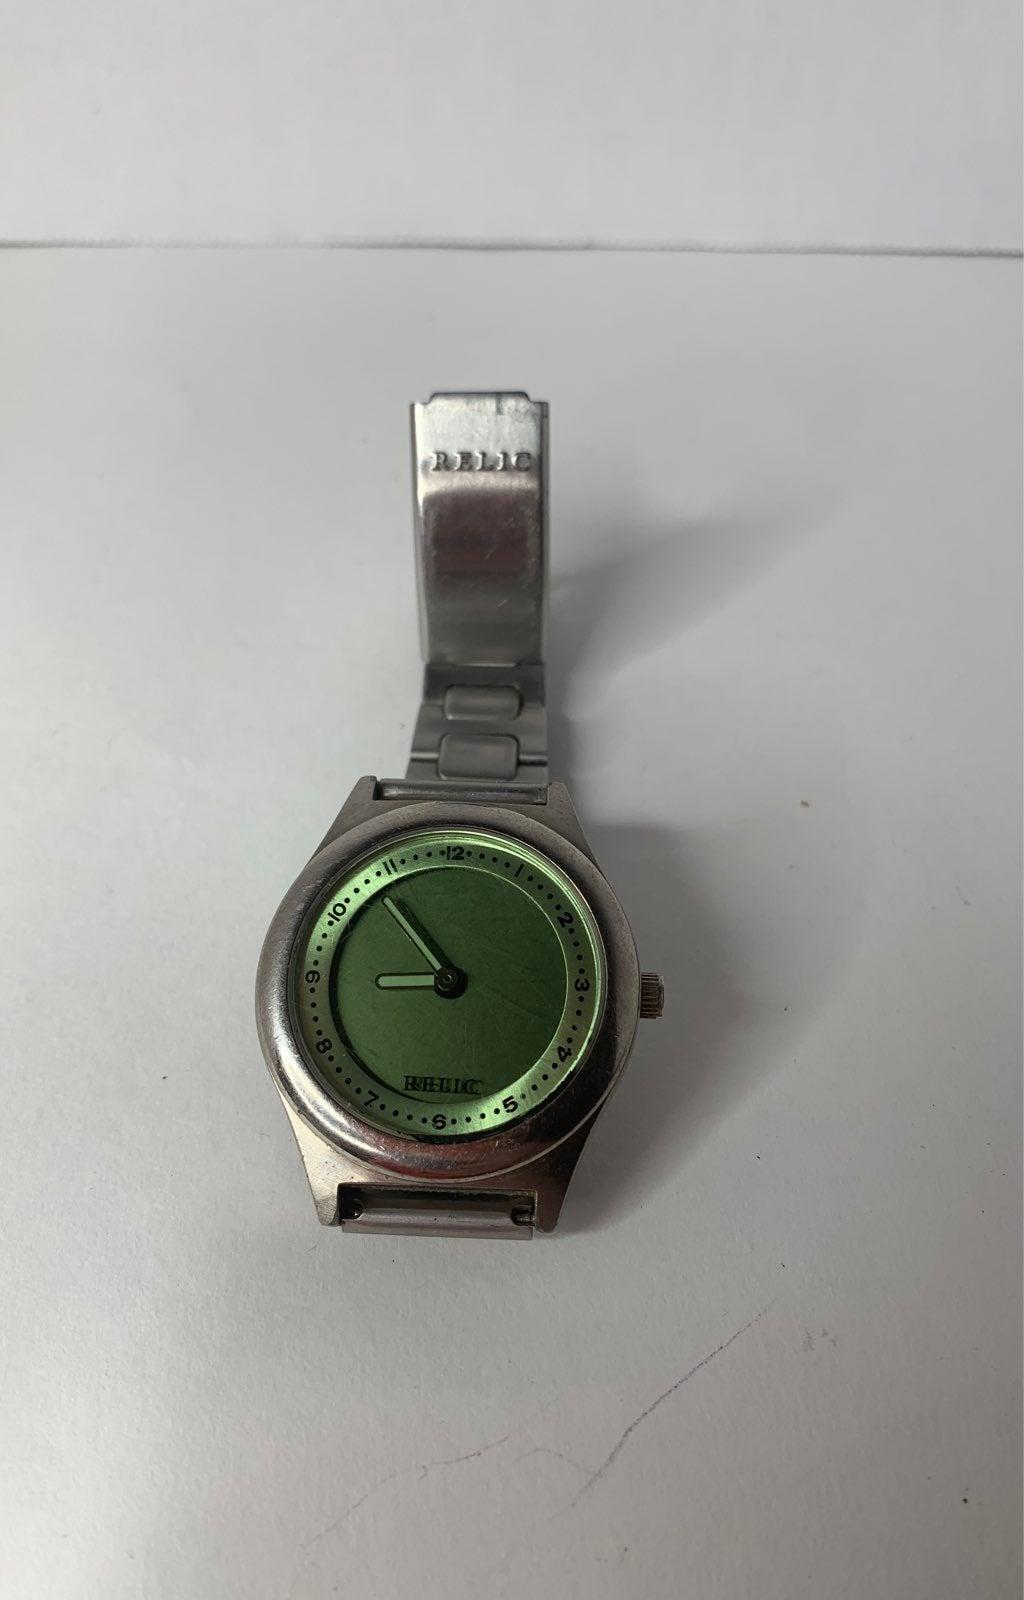 Vintage Reclic watch